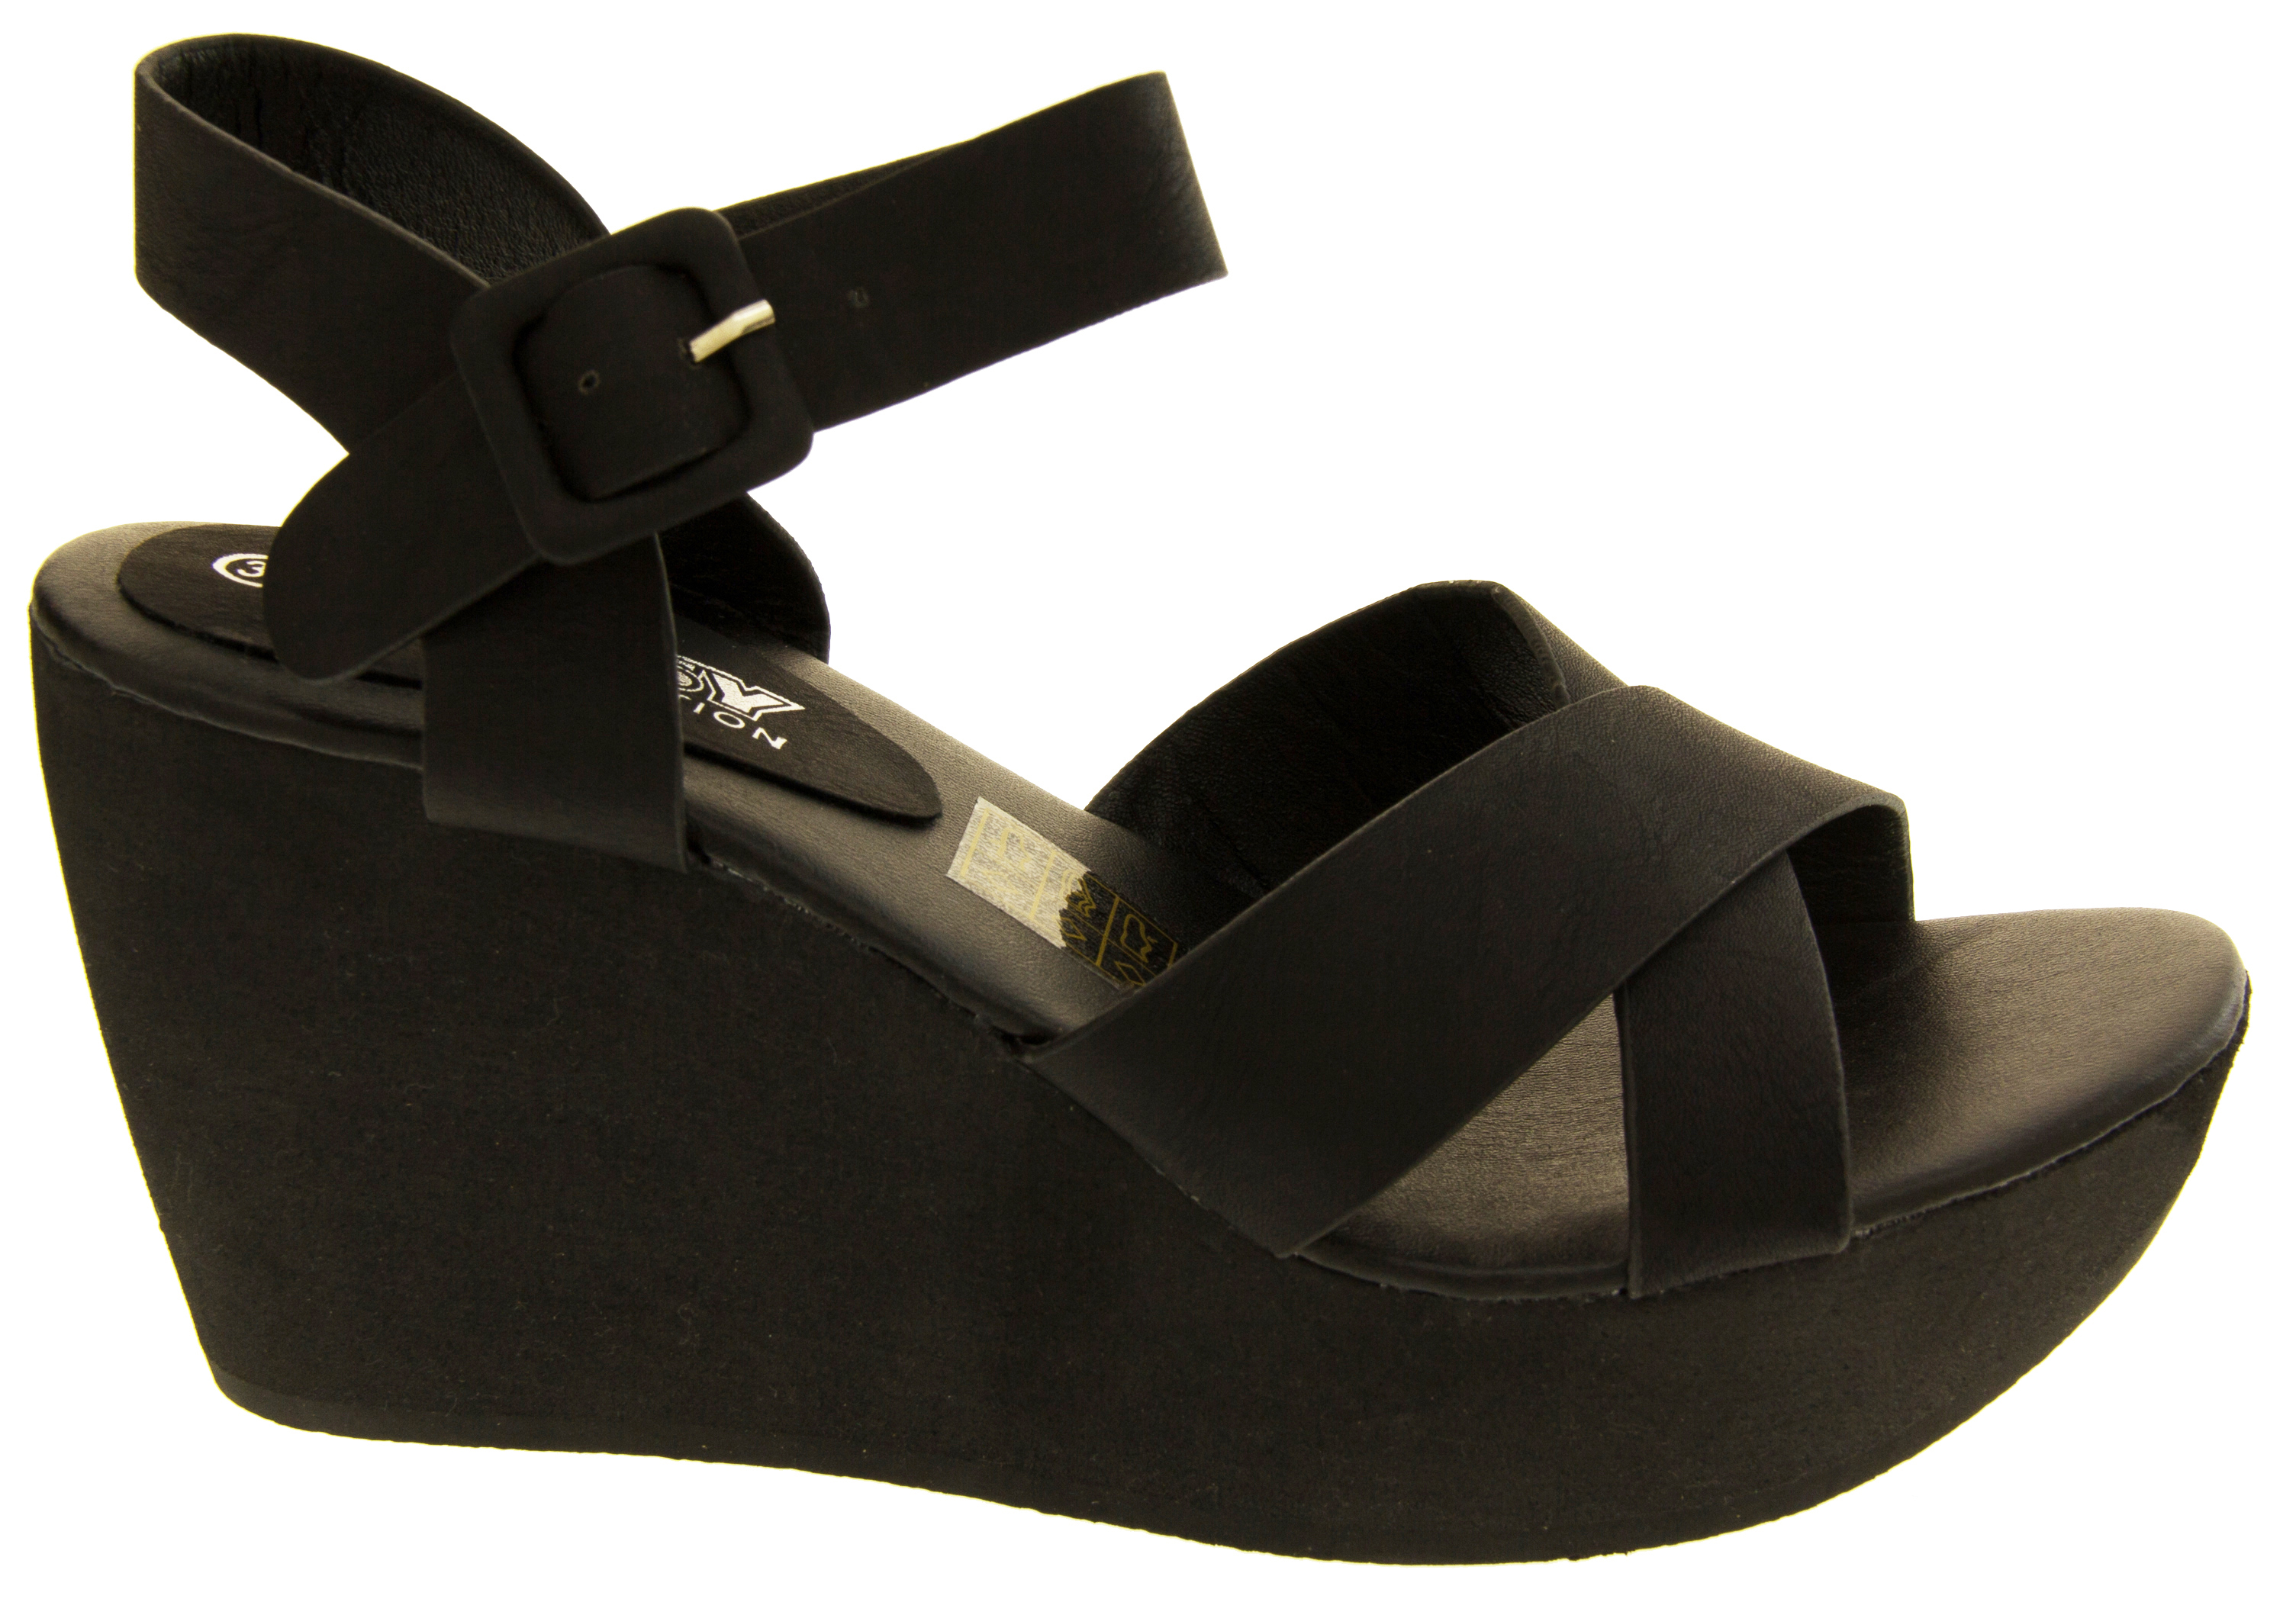 Ladies Platform Wedge Sandals Stylish Fashion Designer ...